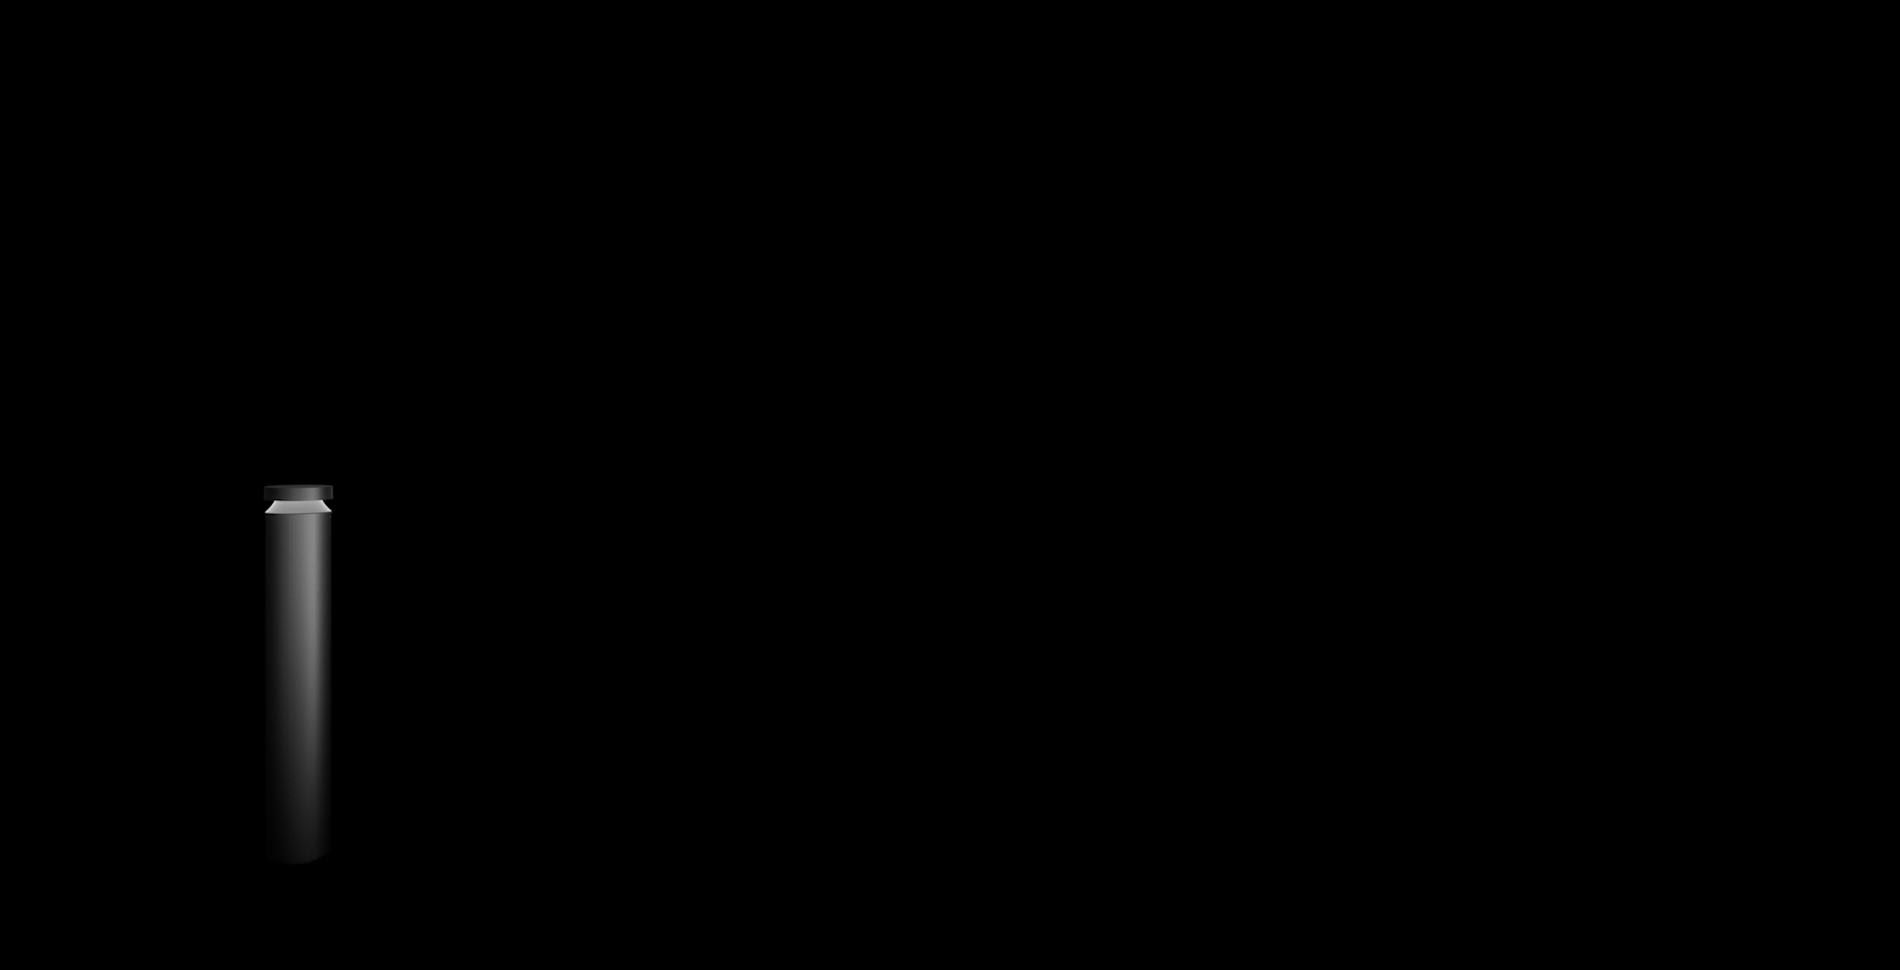 Sequenza-0228